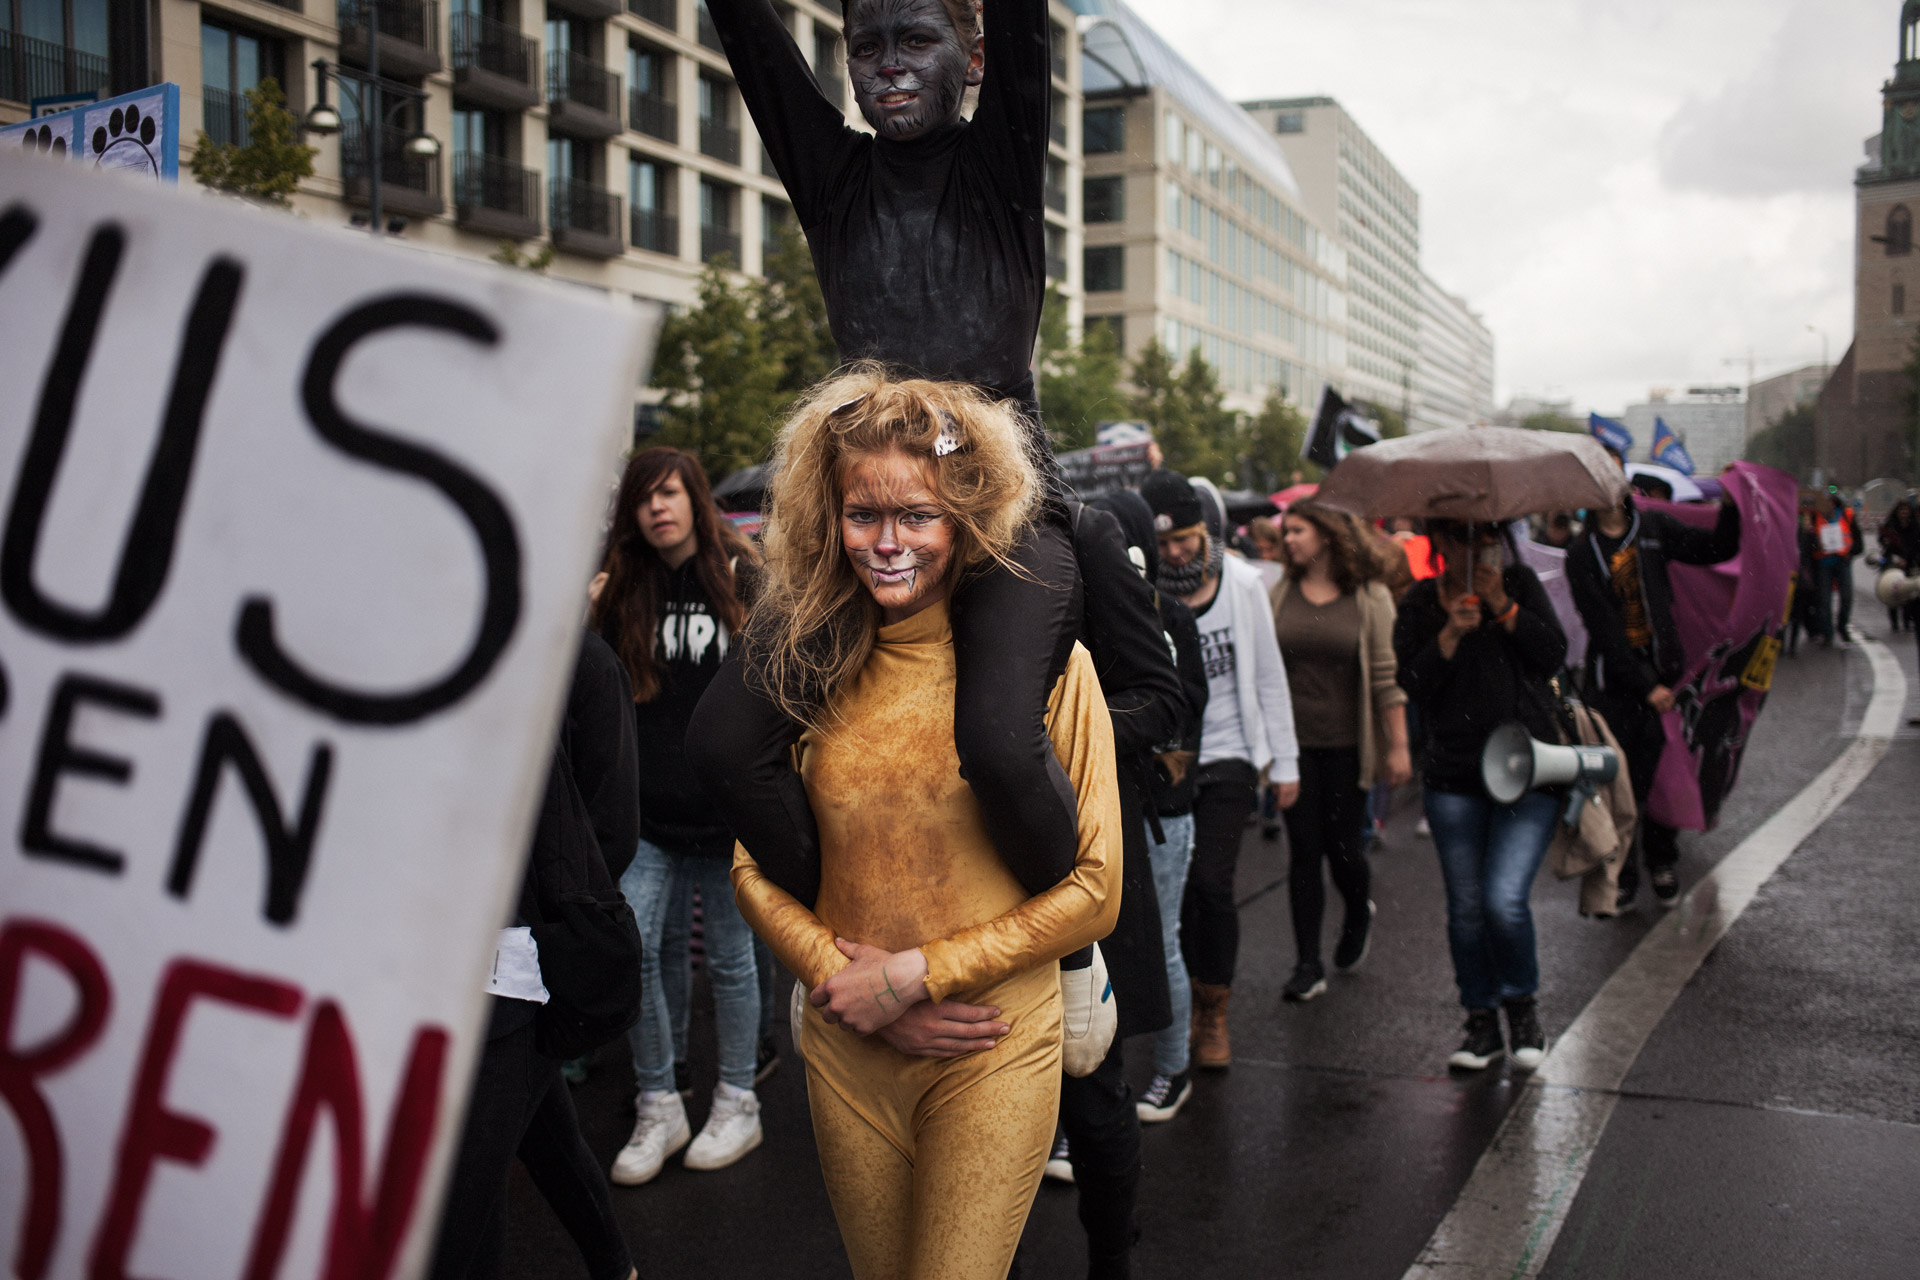 timo-stammberger-photography-fotografie-animal-rights-tierrechte-activism-aktivismus-demonstration-berlin-compassion